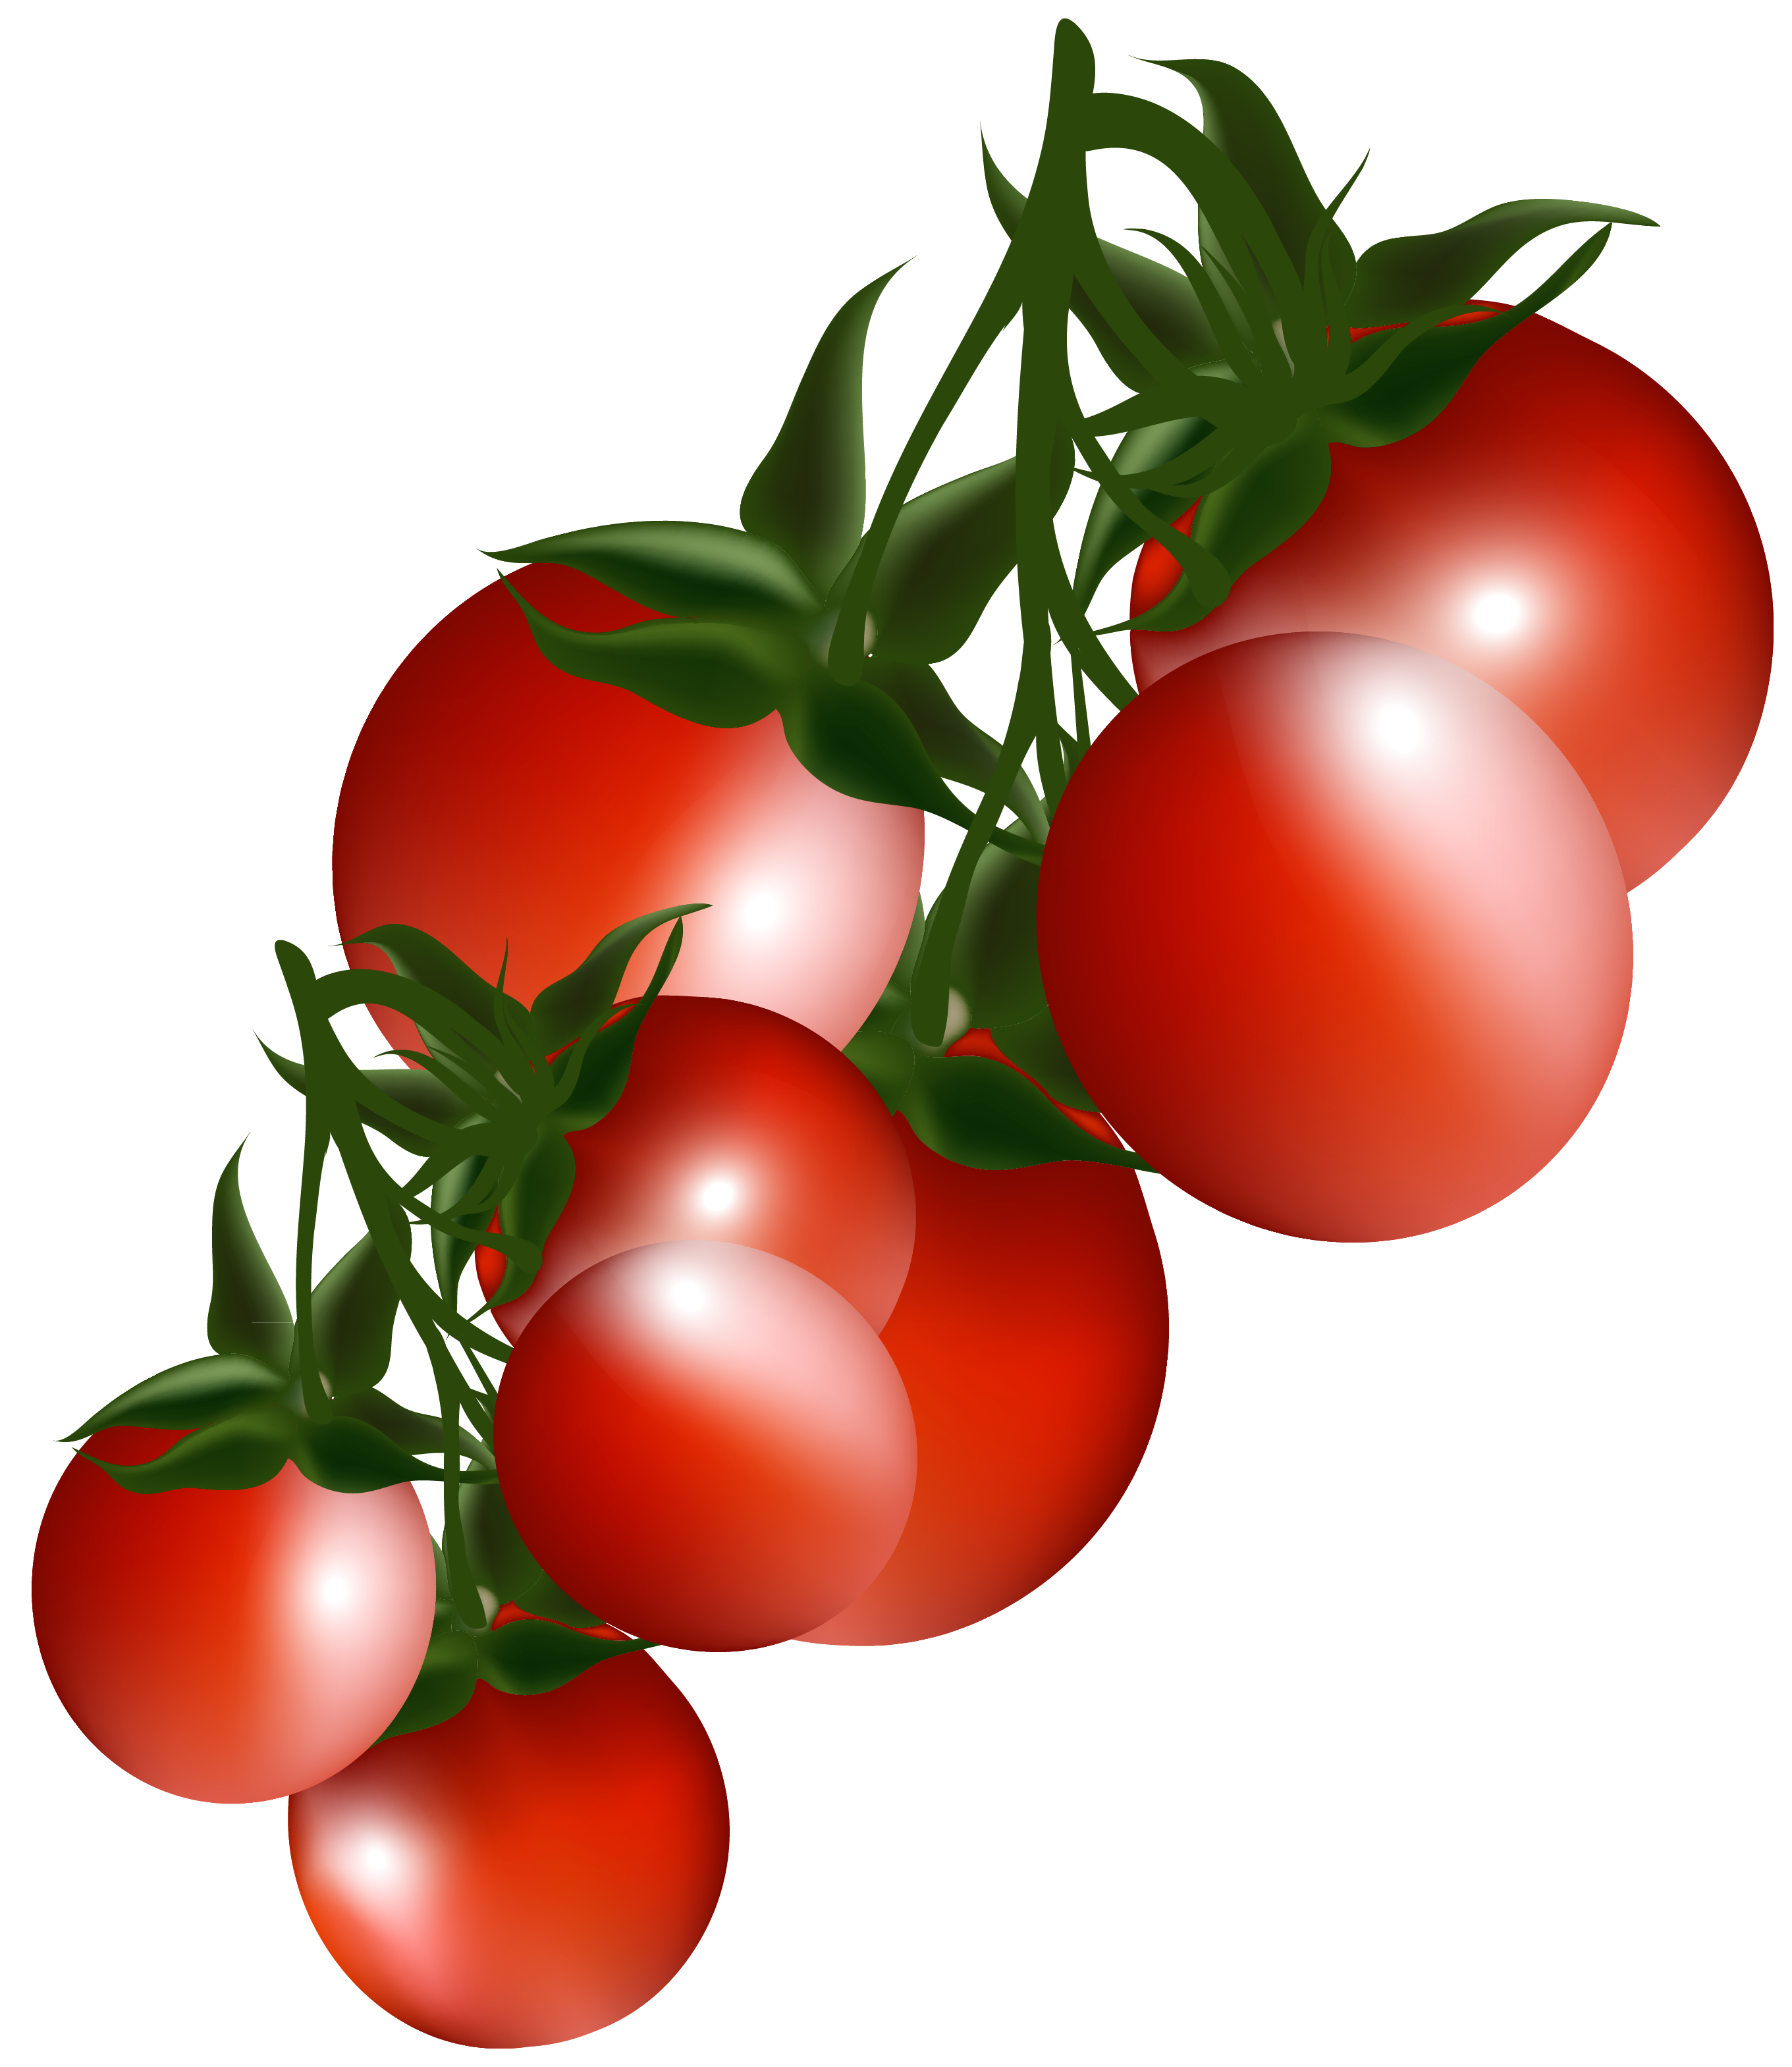 Free Tomatos Cliparts, Download Free Clip Art, Free Clip Art.